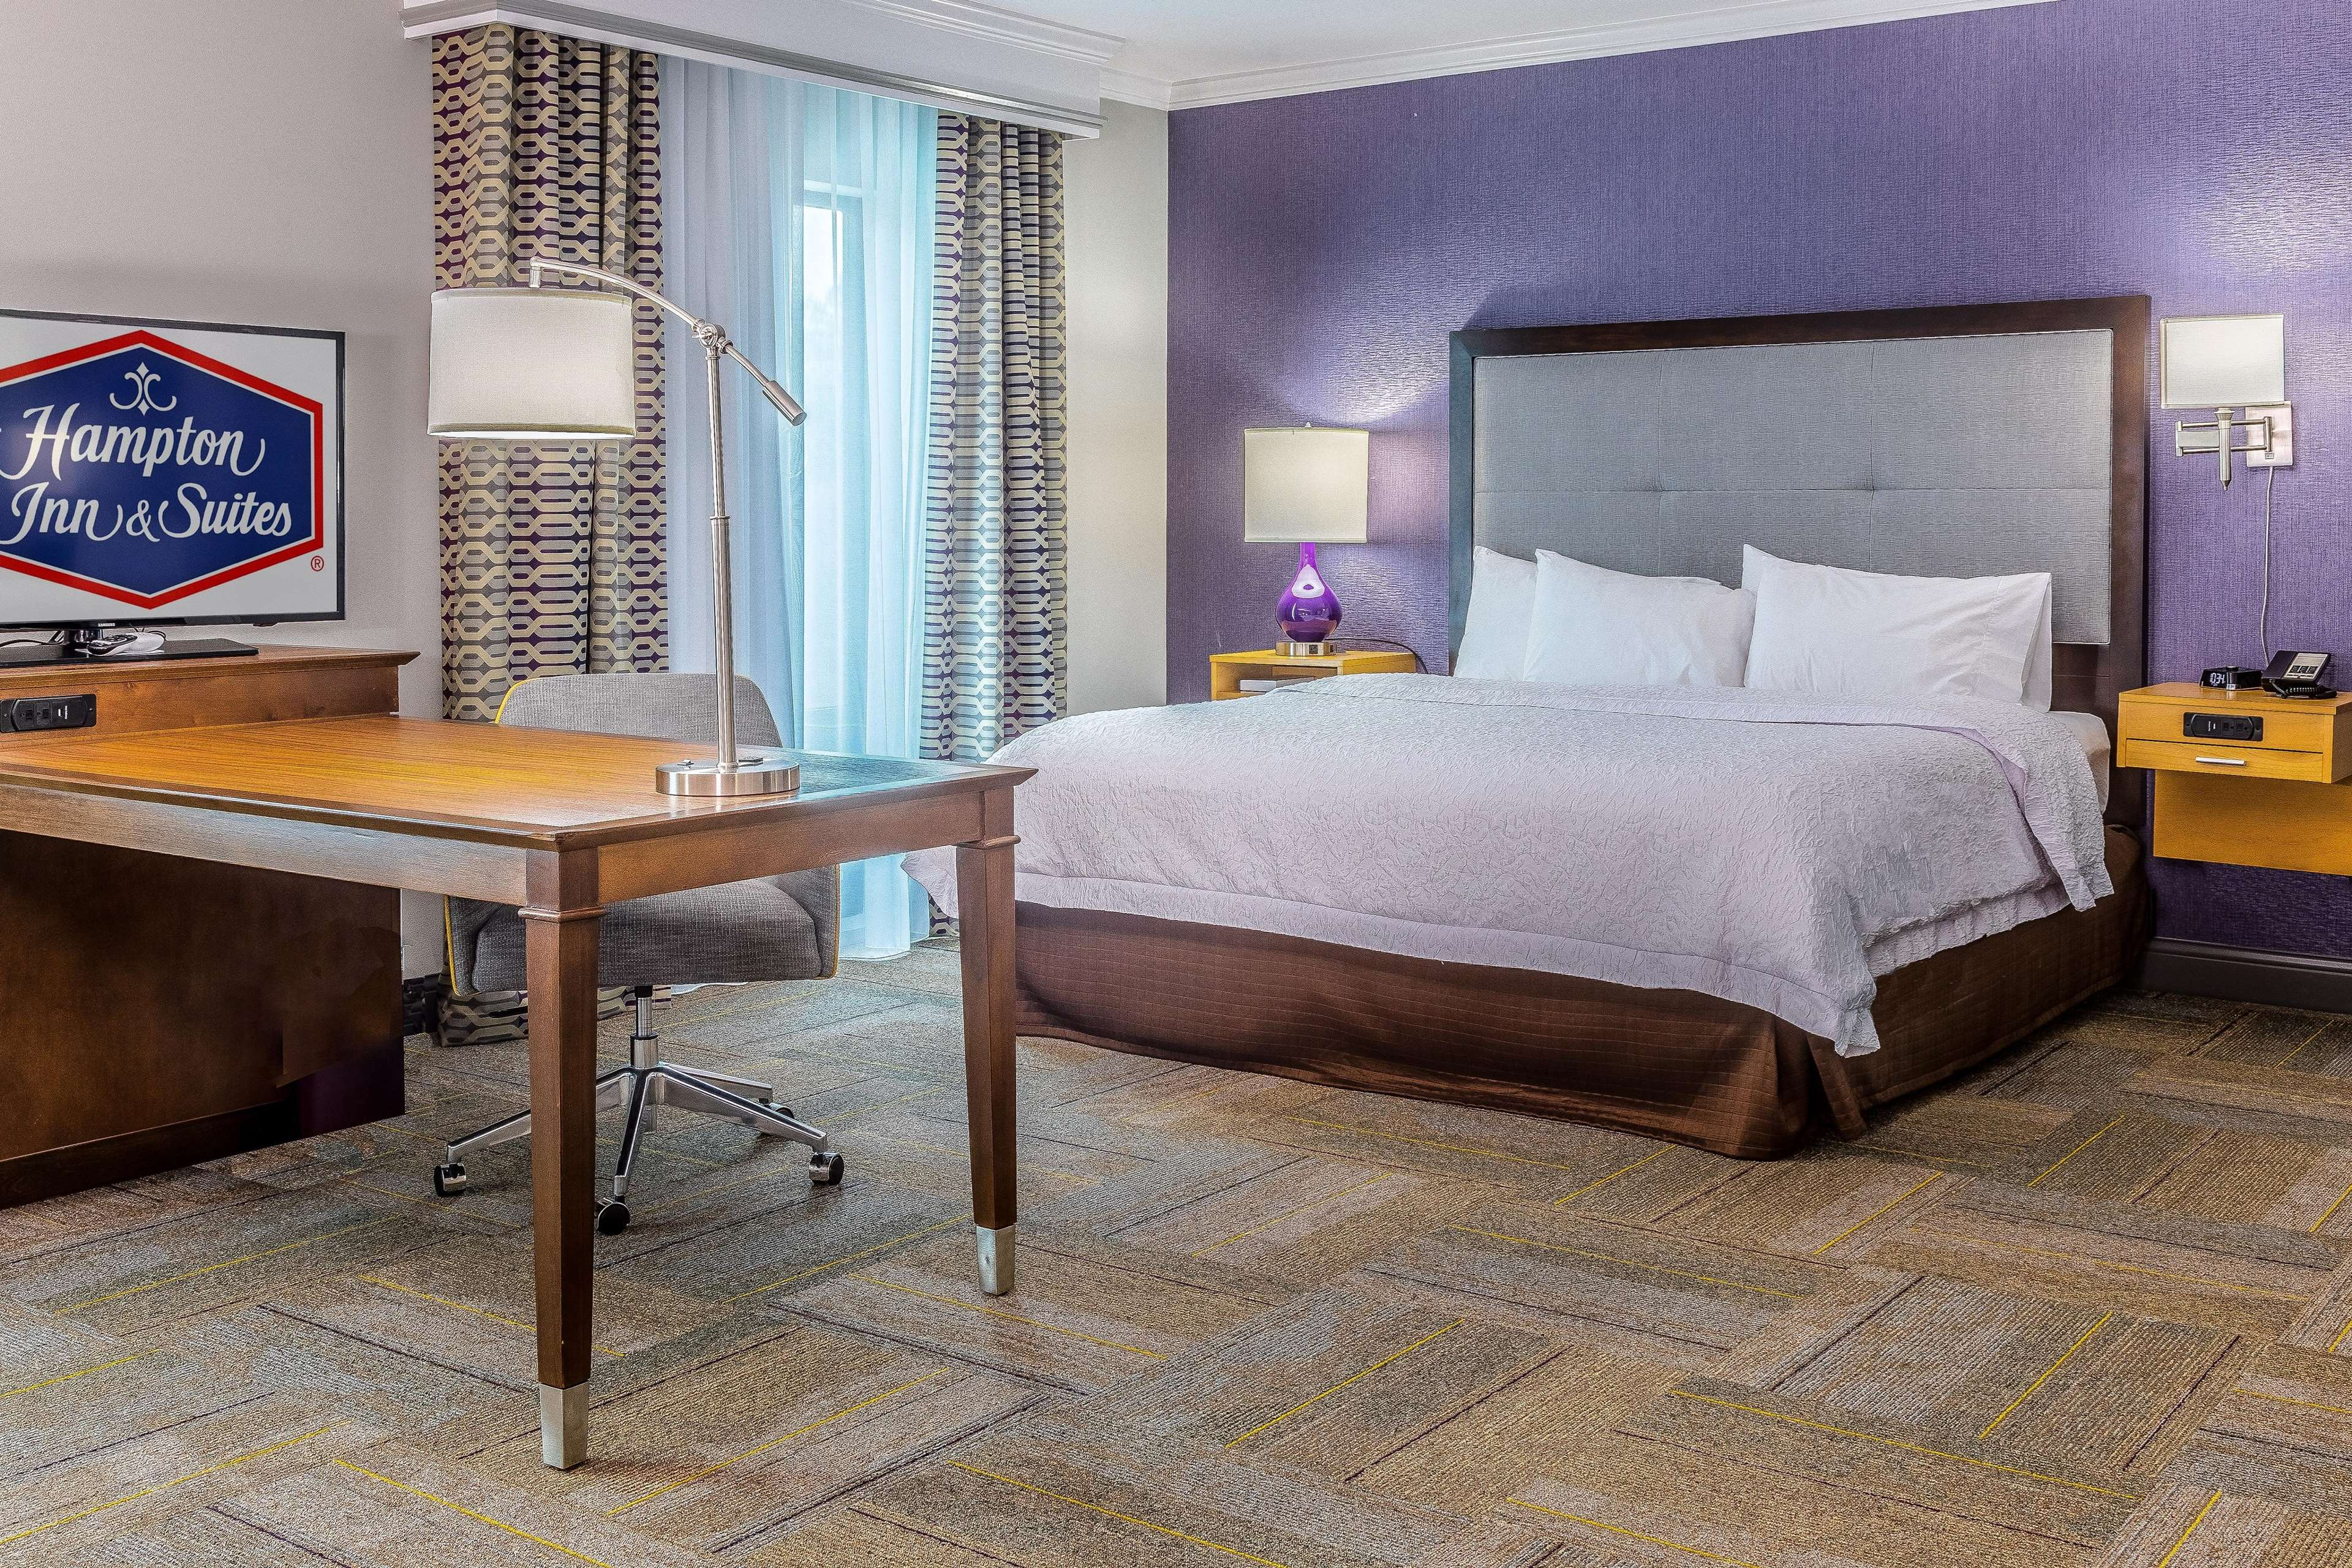 Hampton Inn & Suites Dublin image 31